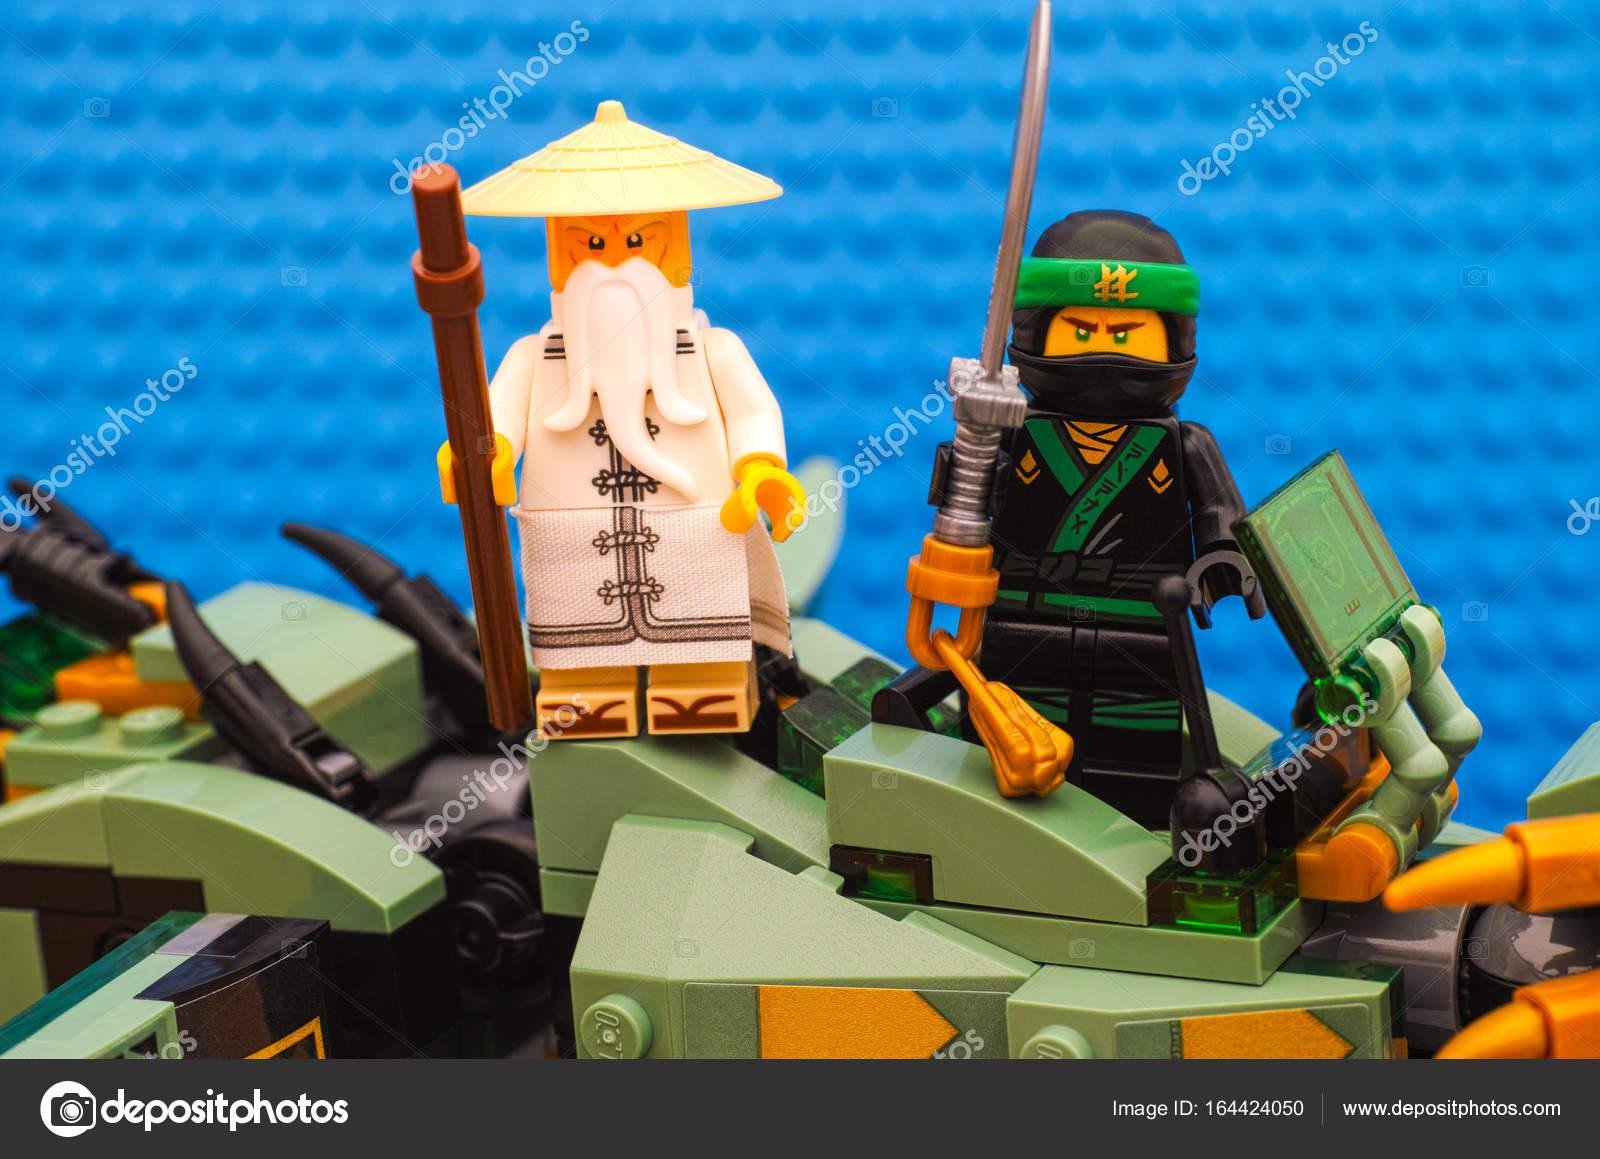 Pictures Ninjago Lego Sets Lego Ninjago Movie The Green Ninja And Wu Standing On Green Nin Stock Editorial Photo C Rosinka79 164424050